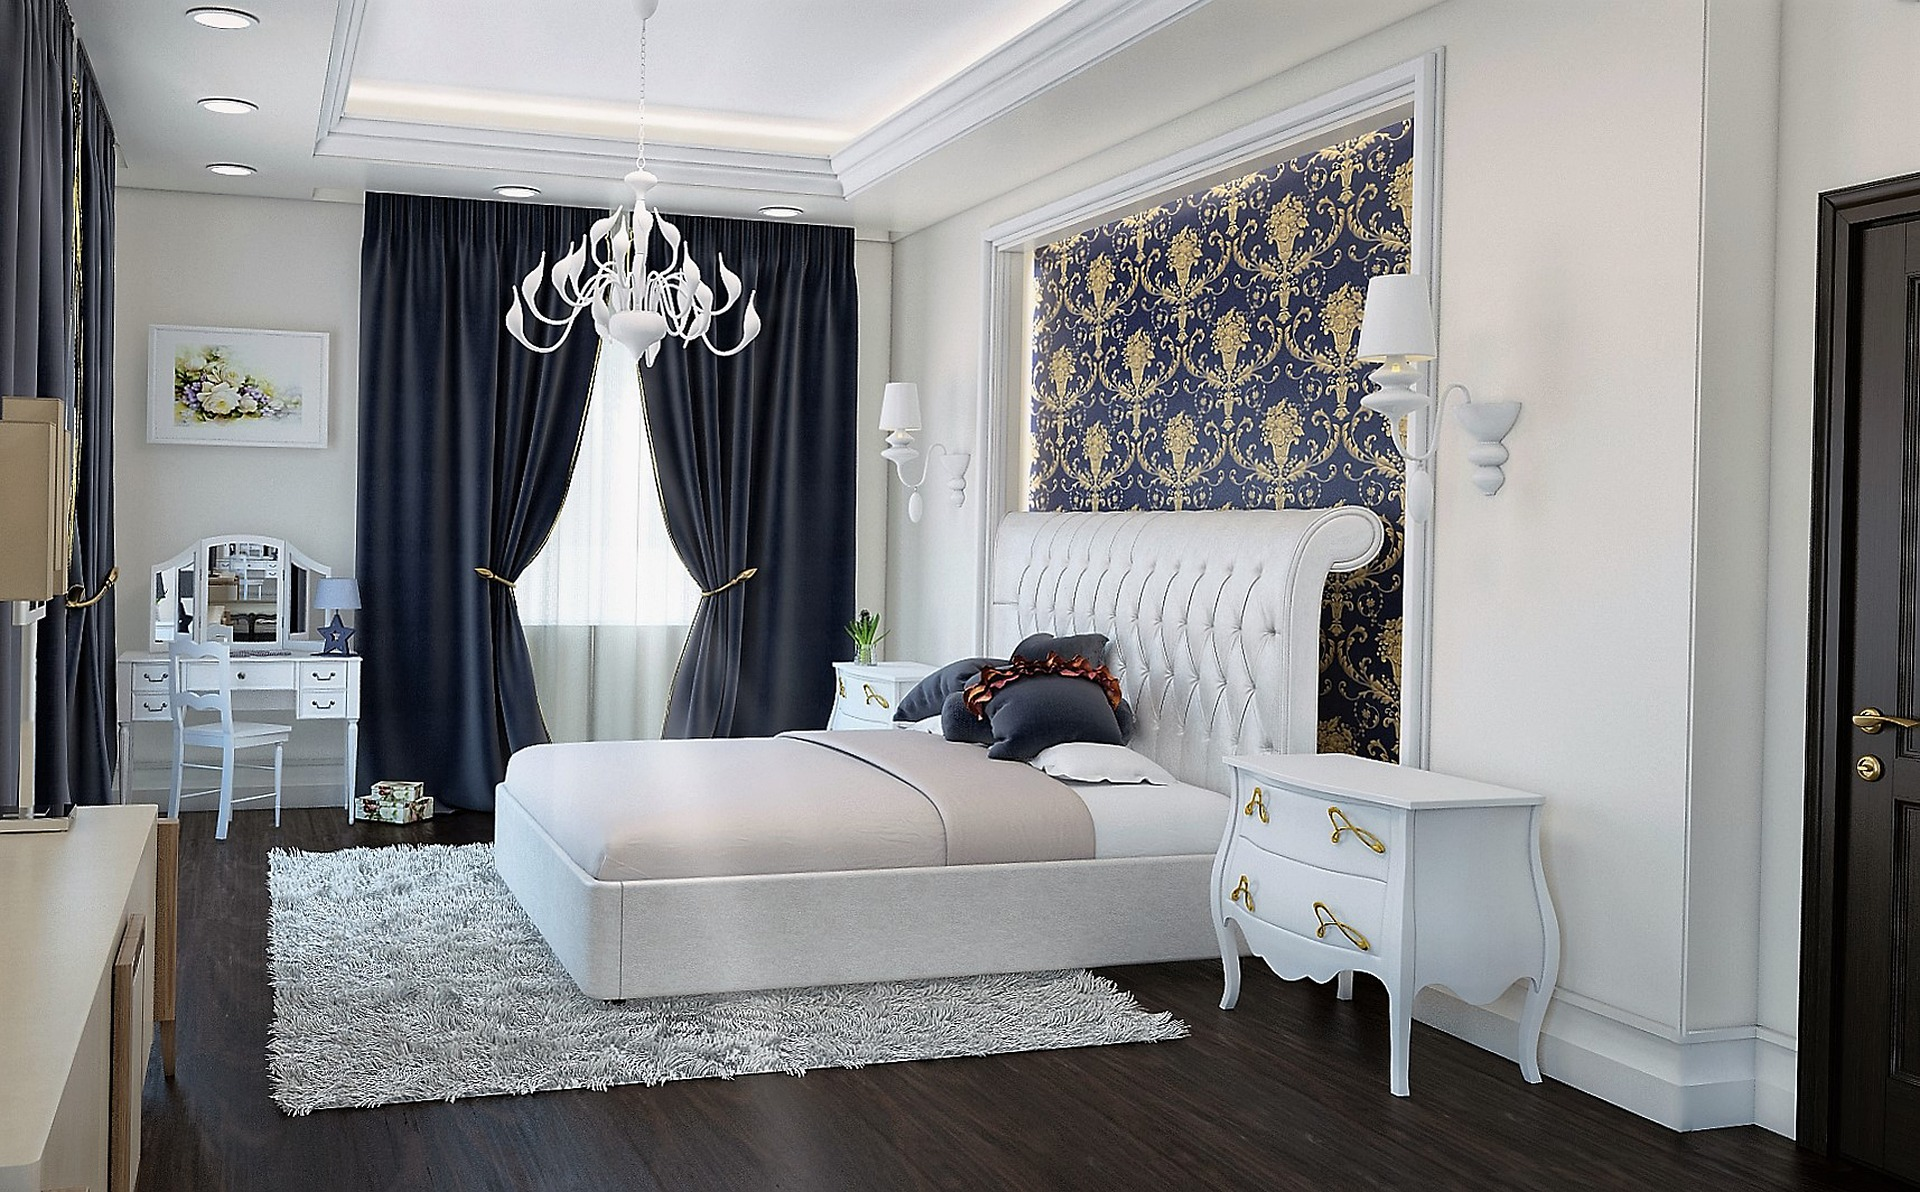 Ložnice luxusní interiér